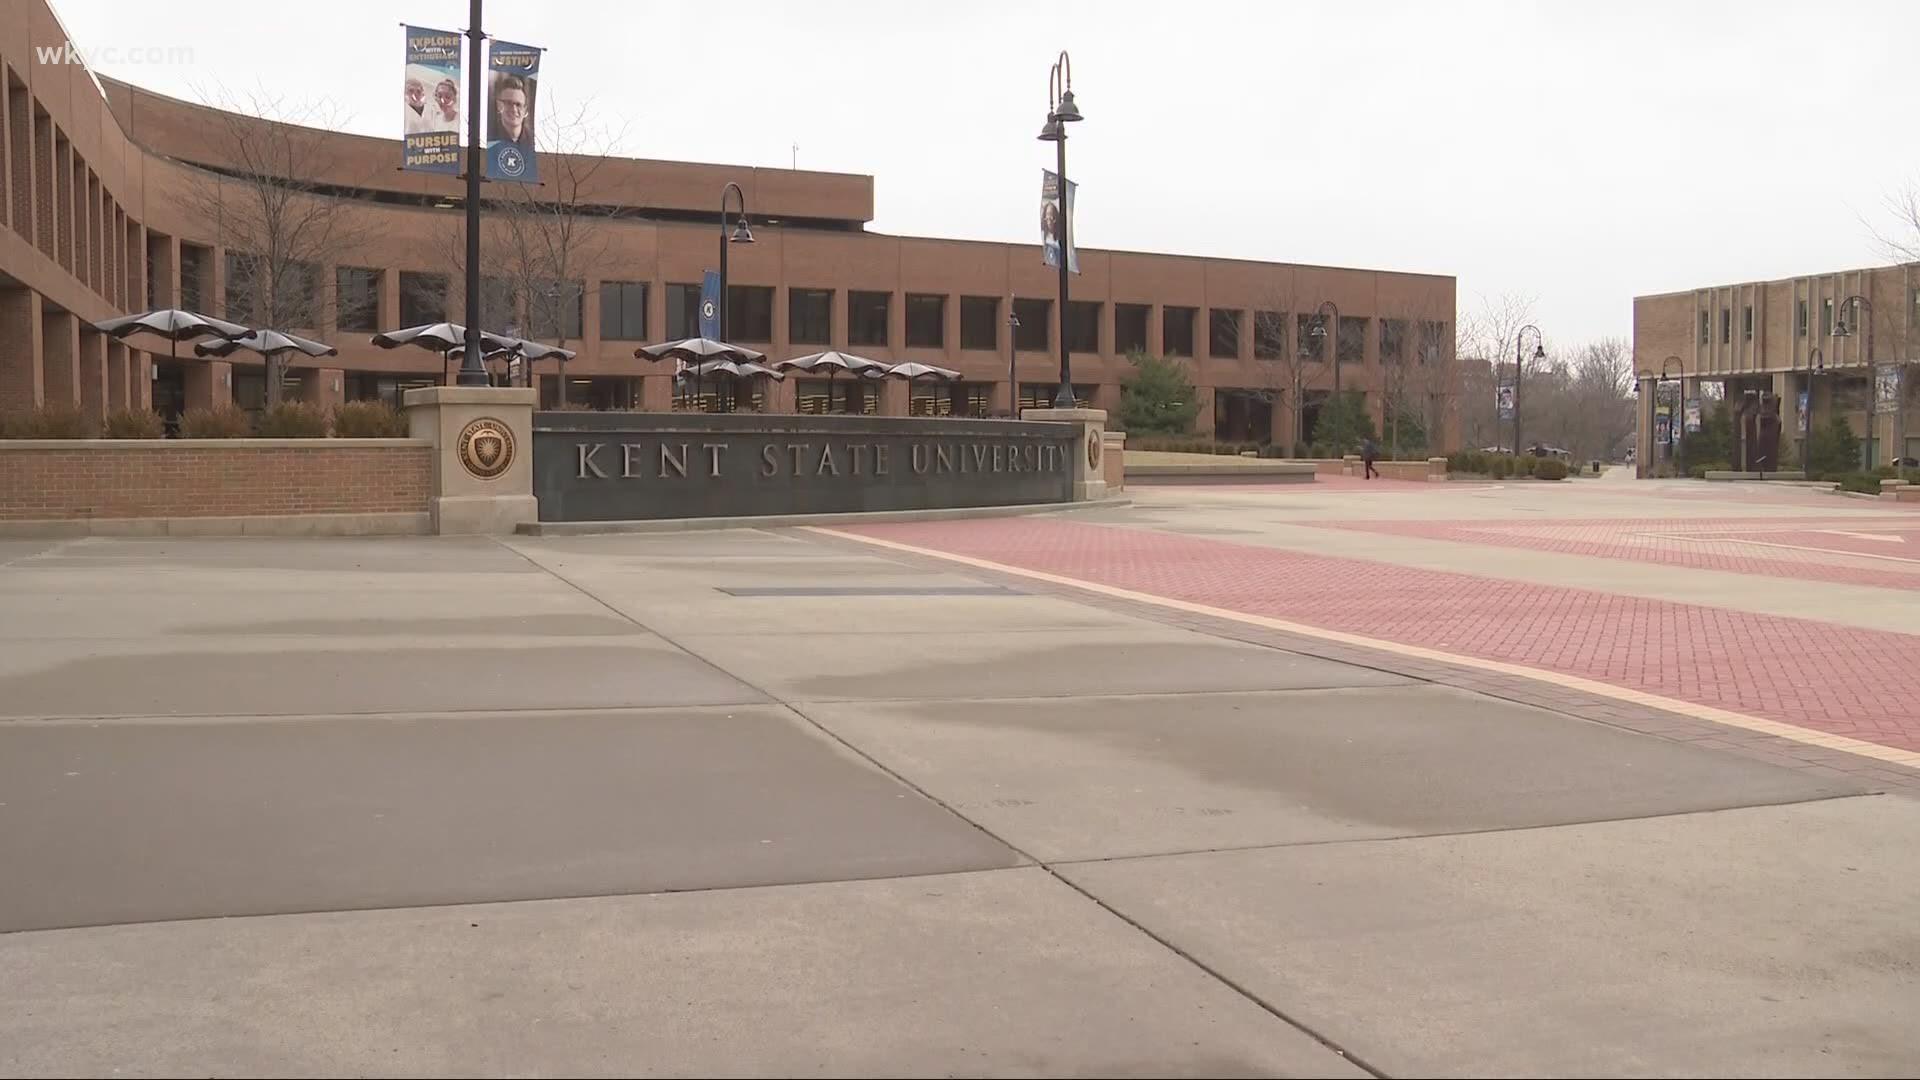 Kent State University Calendar 2021 Kent State announces plans for Fall Semester return, eliminates